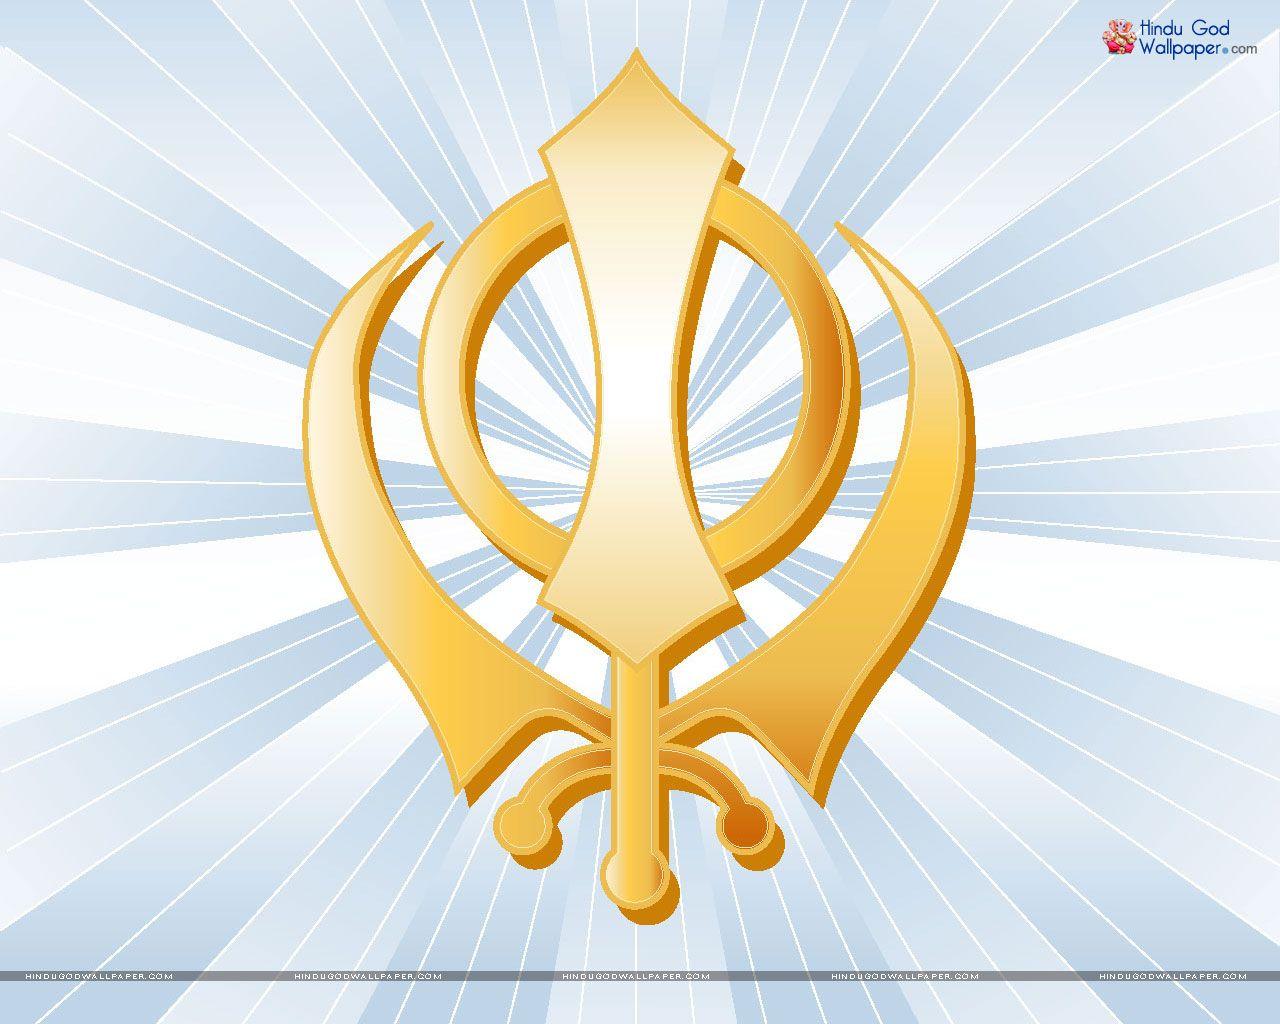 Sikh Symbol Wallpaper Sikh Logo Wallpaper Download Guru Nanak